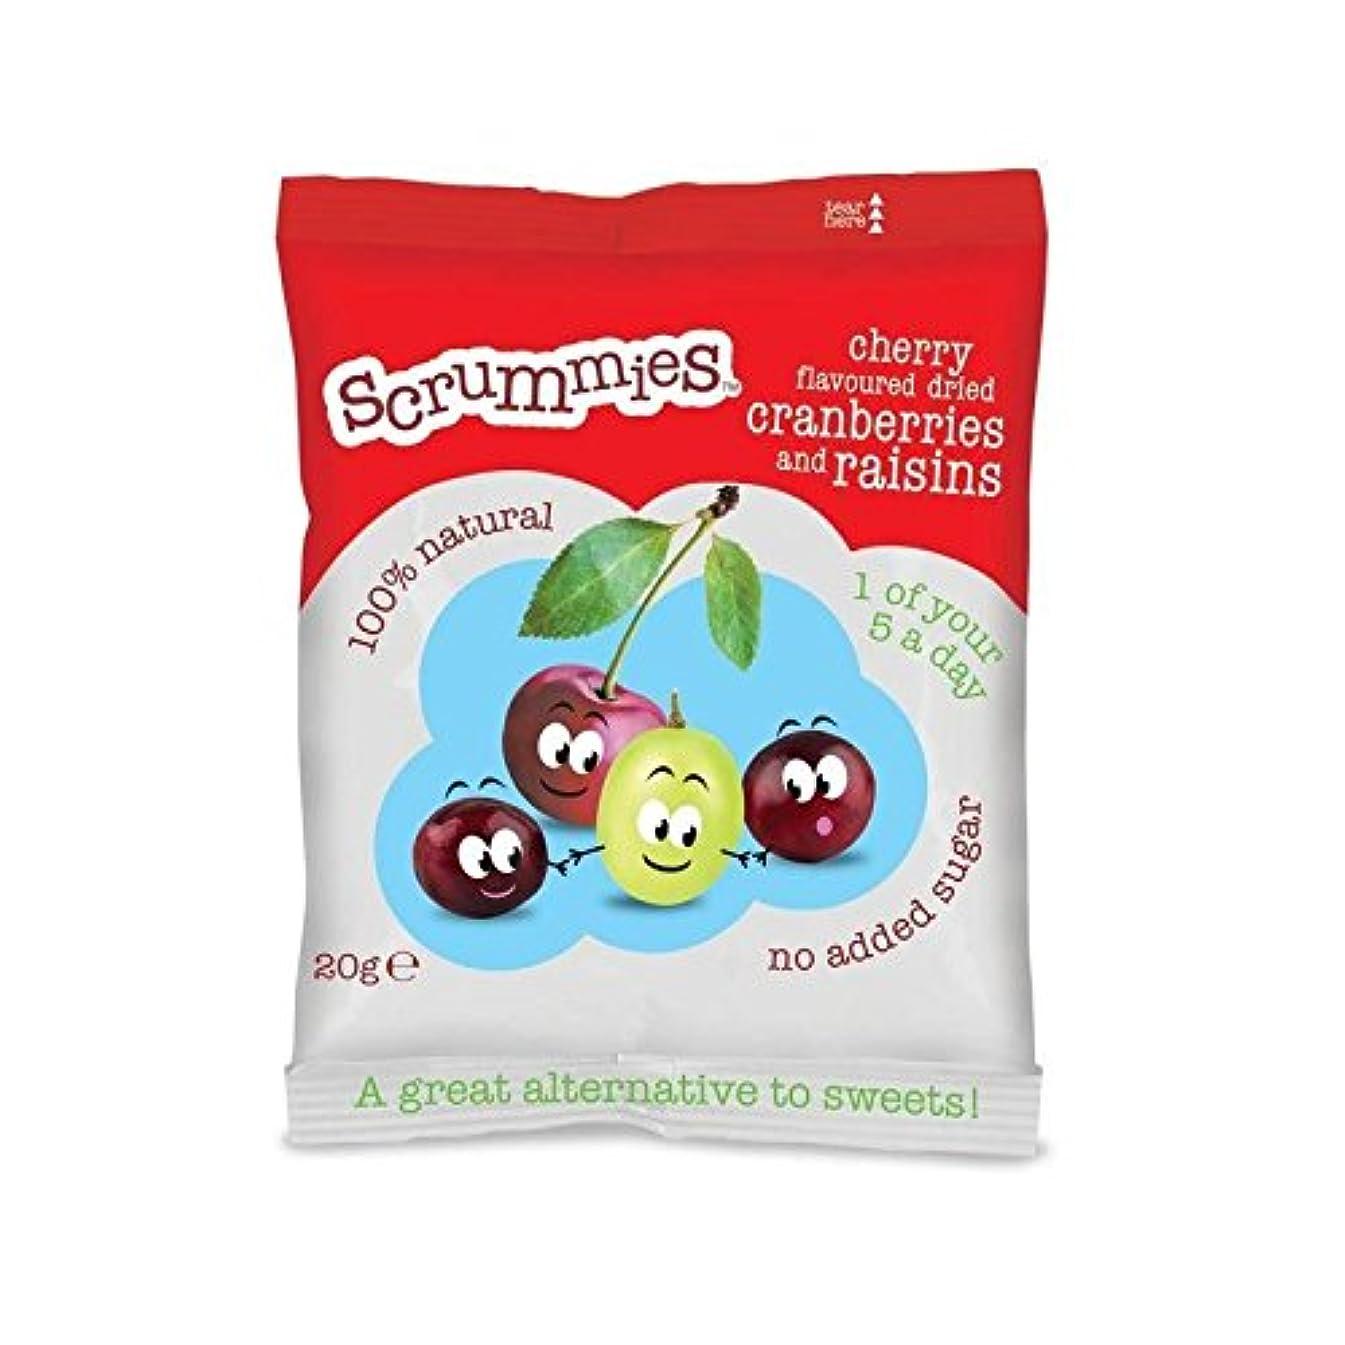 Scrummies Cherry Flavour Cranberries & Raisins 20g - Pack of 6